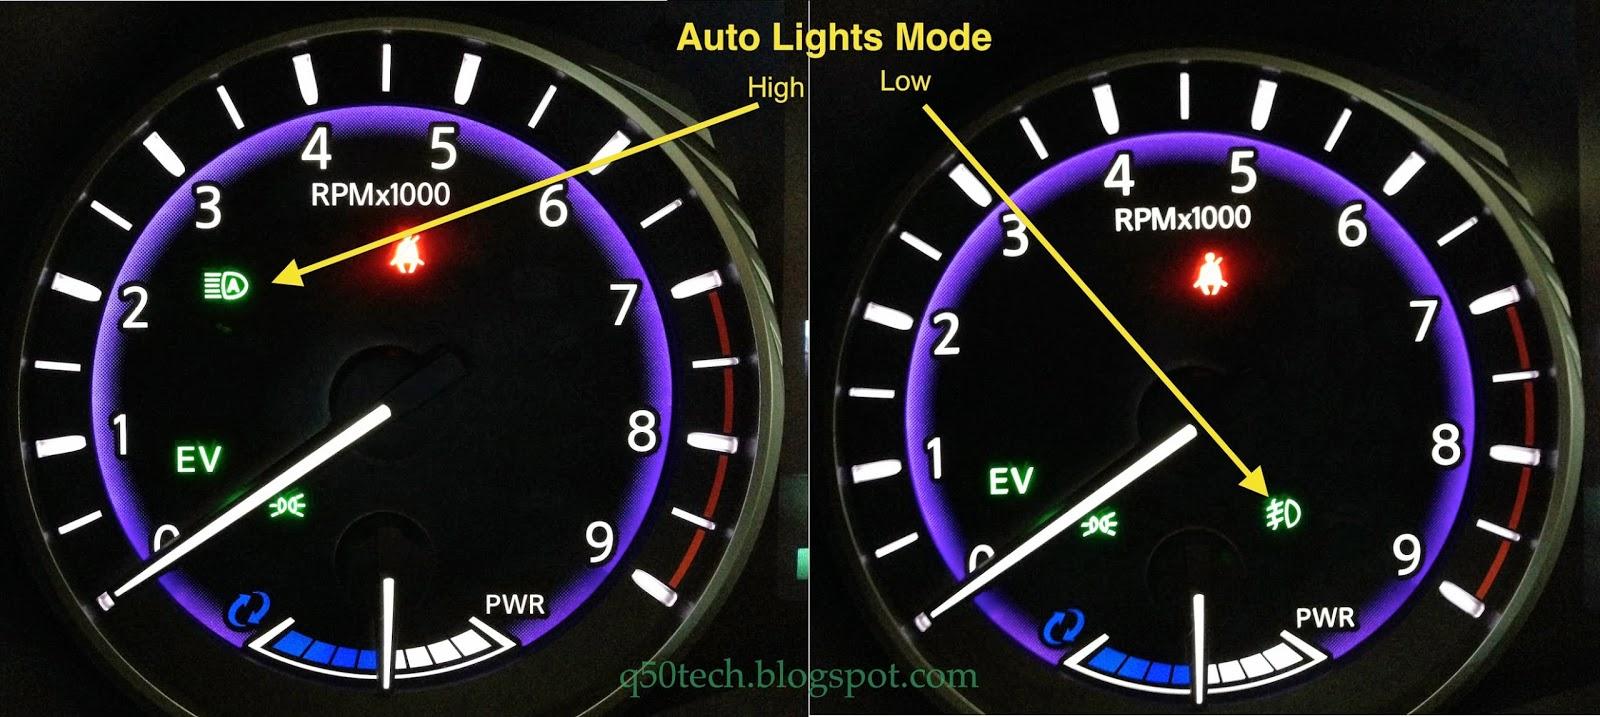 infiniti q50 interior at night. auto mode low u0026 high assist infiniti q50 interior at night